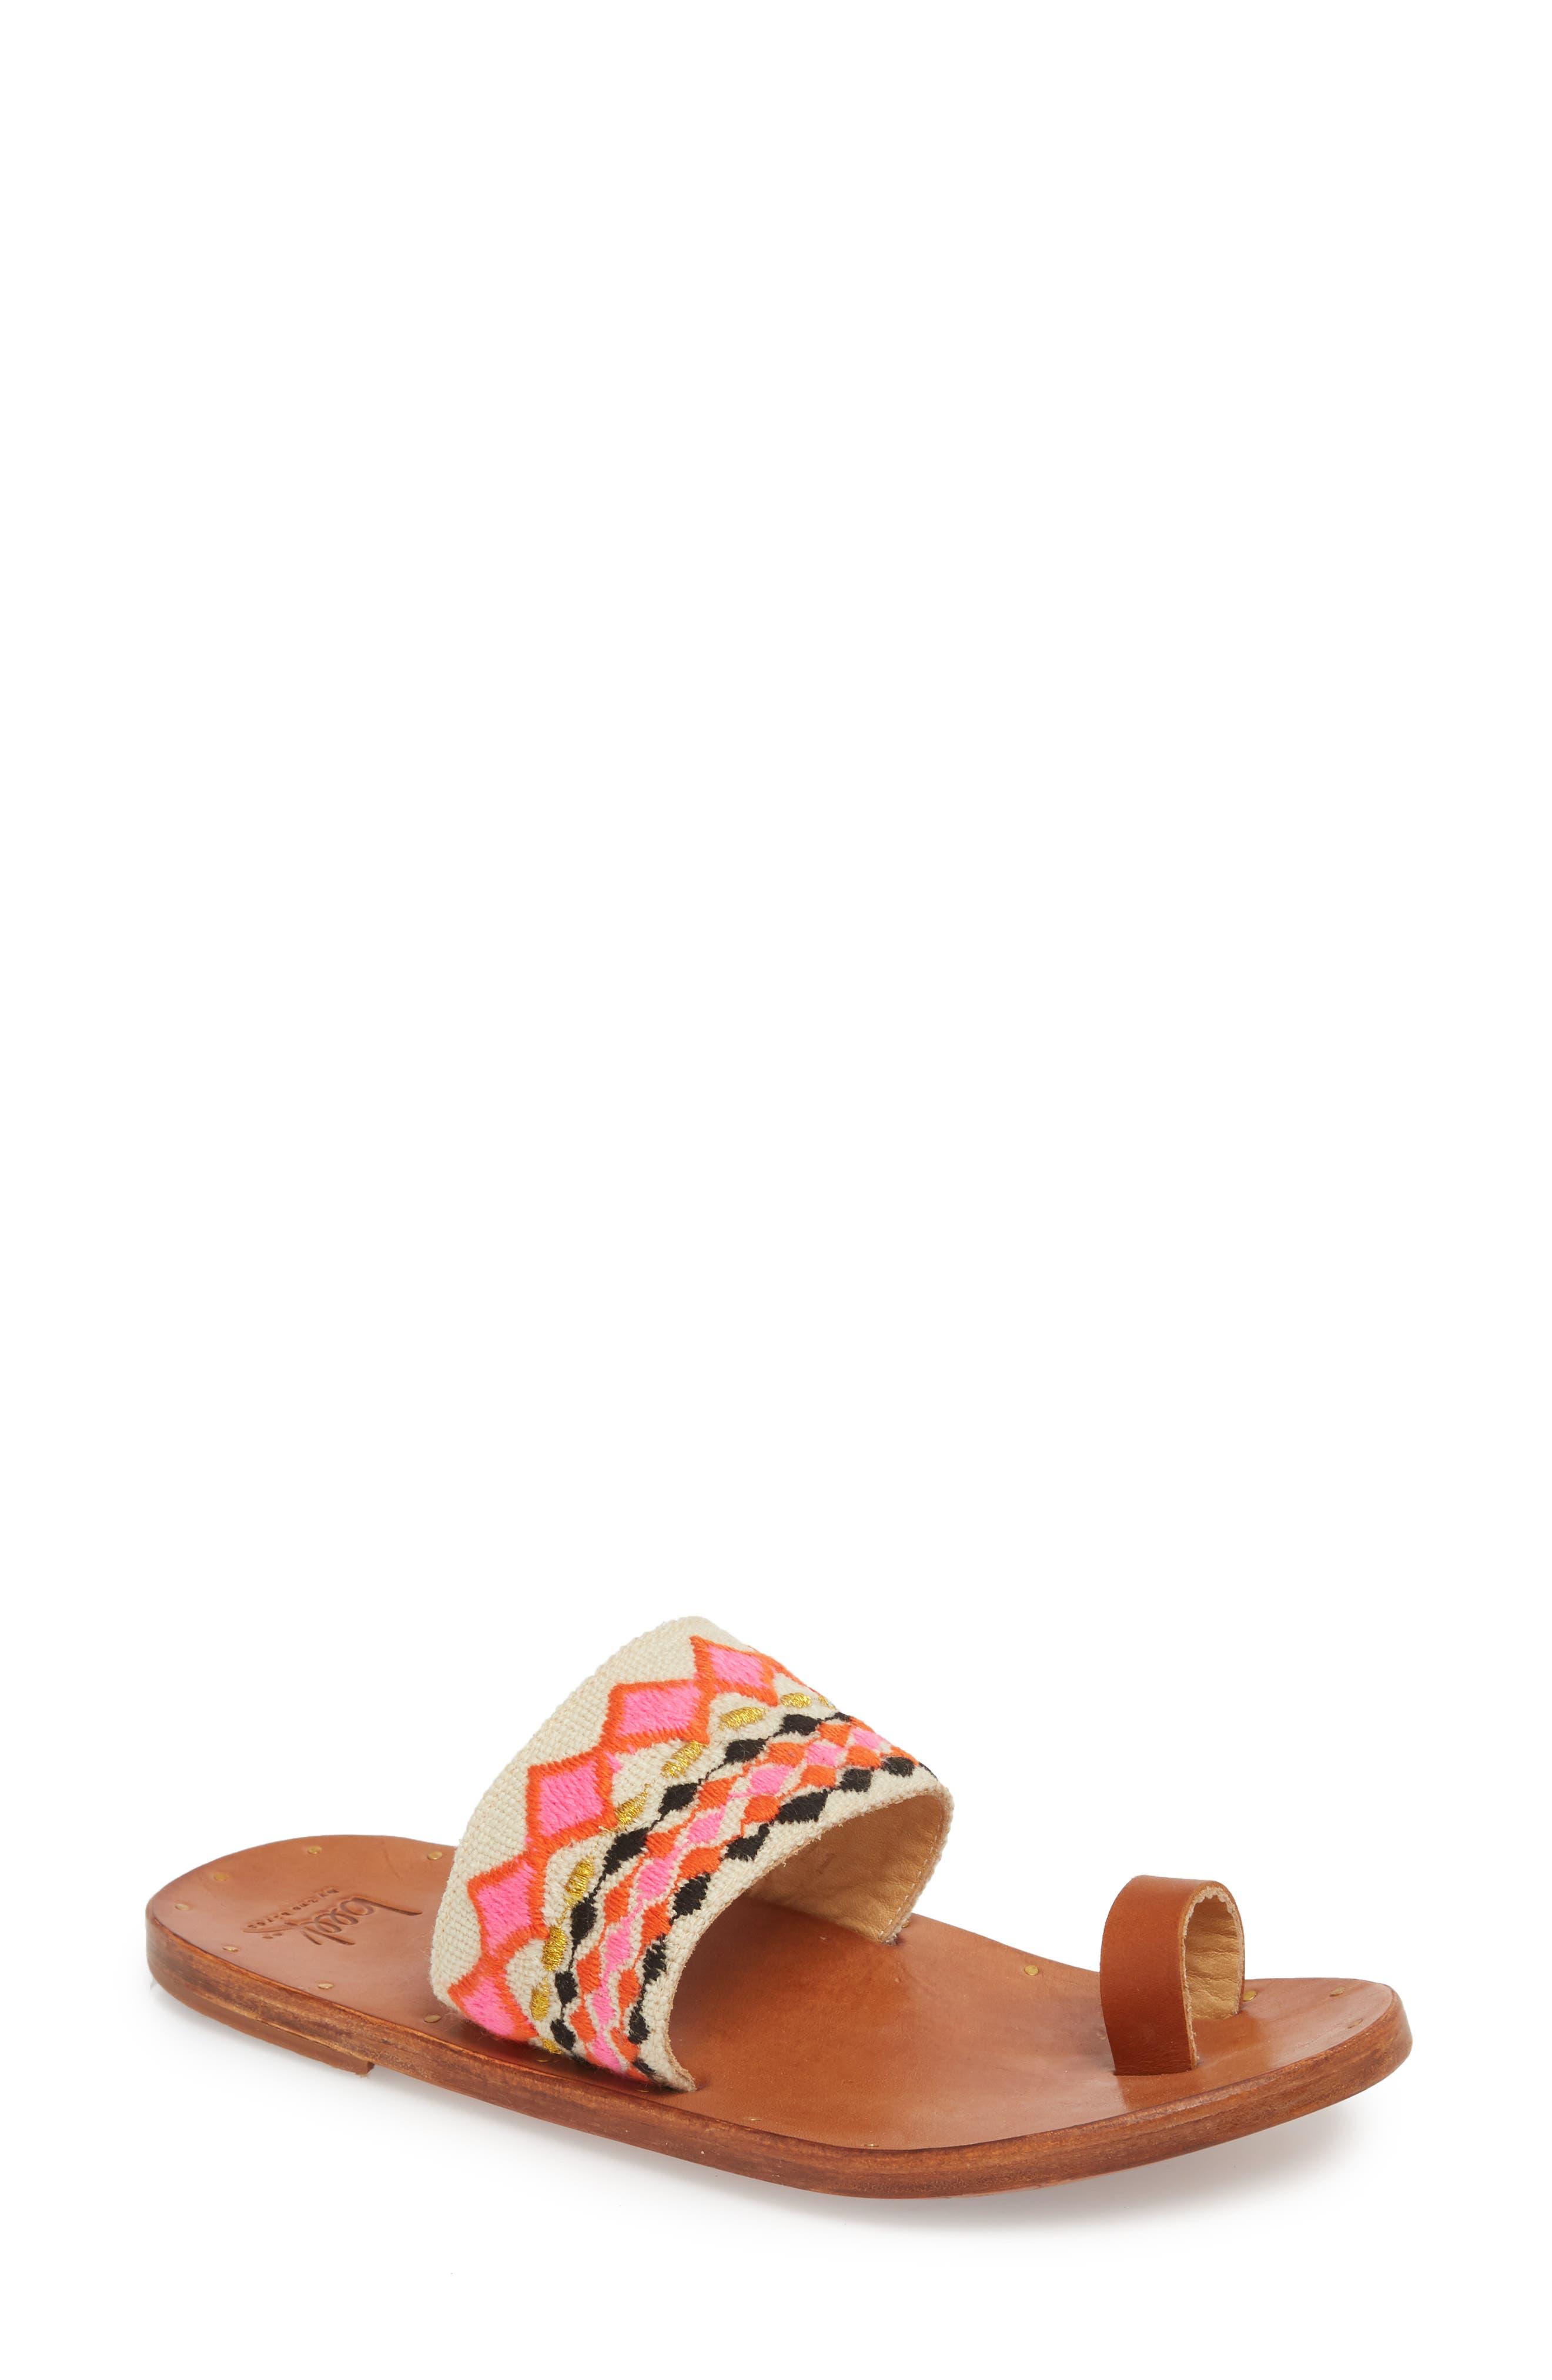 Dove Sandal,                         Main,                         color, Fuschia Multi/ Tan